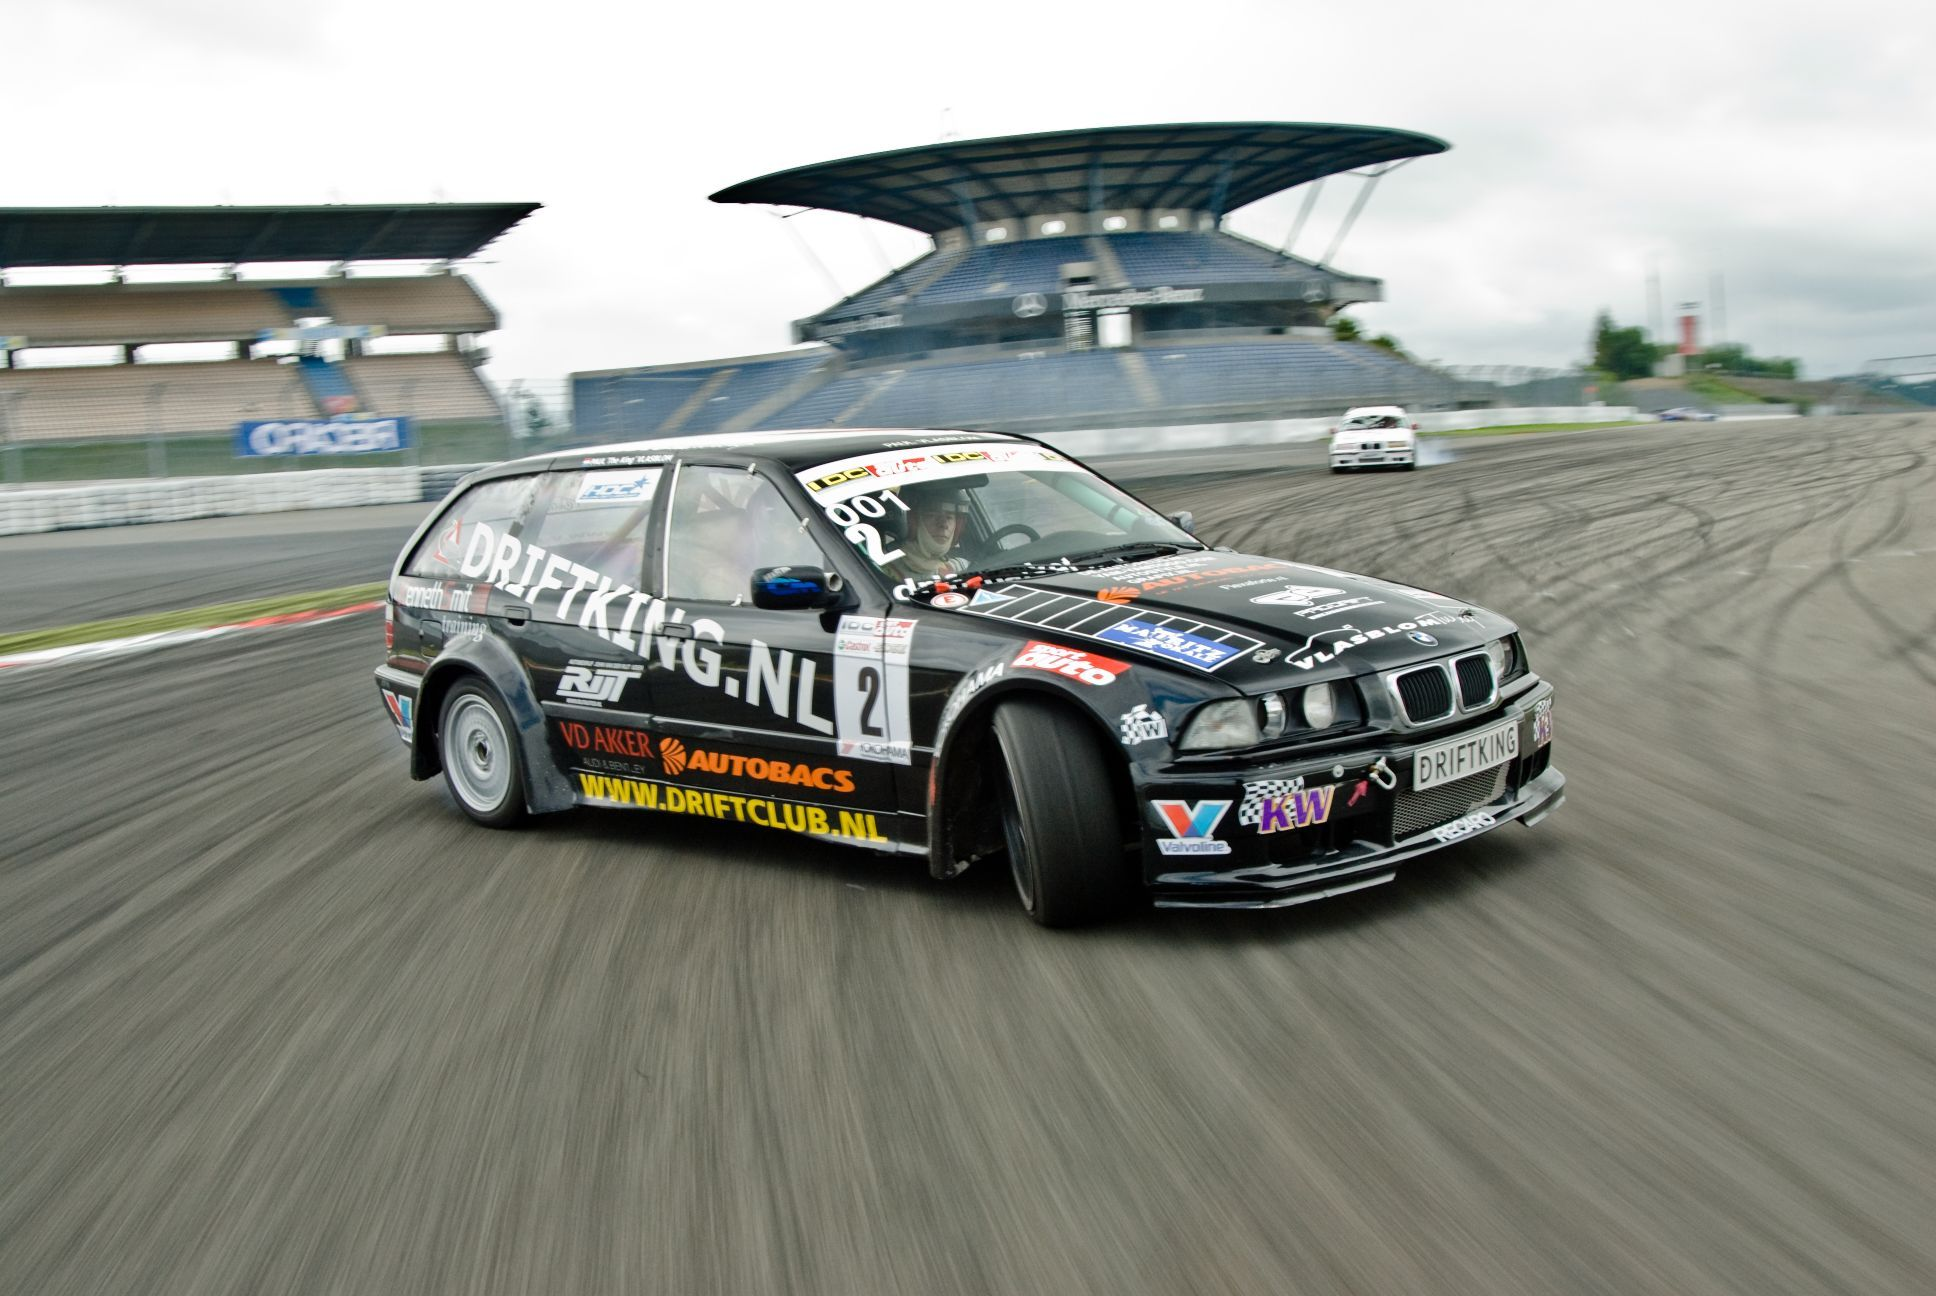 Drift Racing Bmw Drift Car B M W Pinterest Bmw Drifting